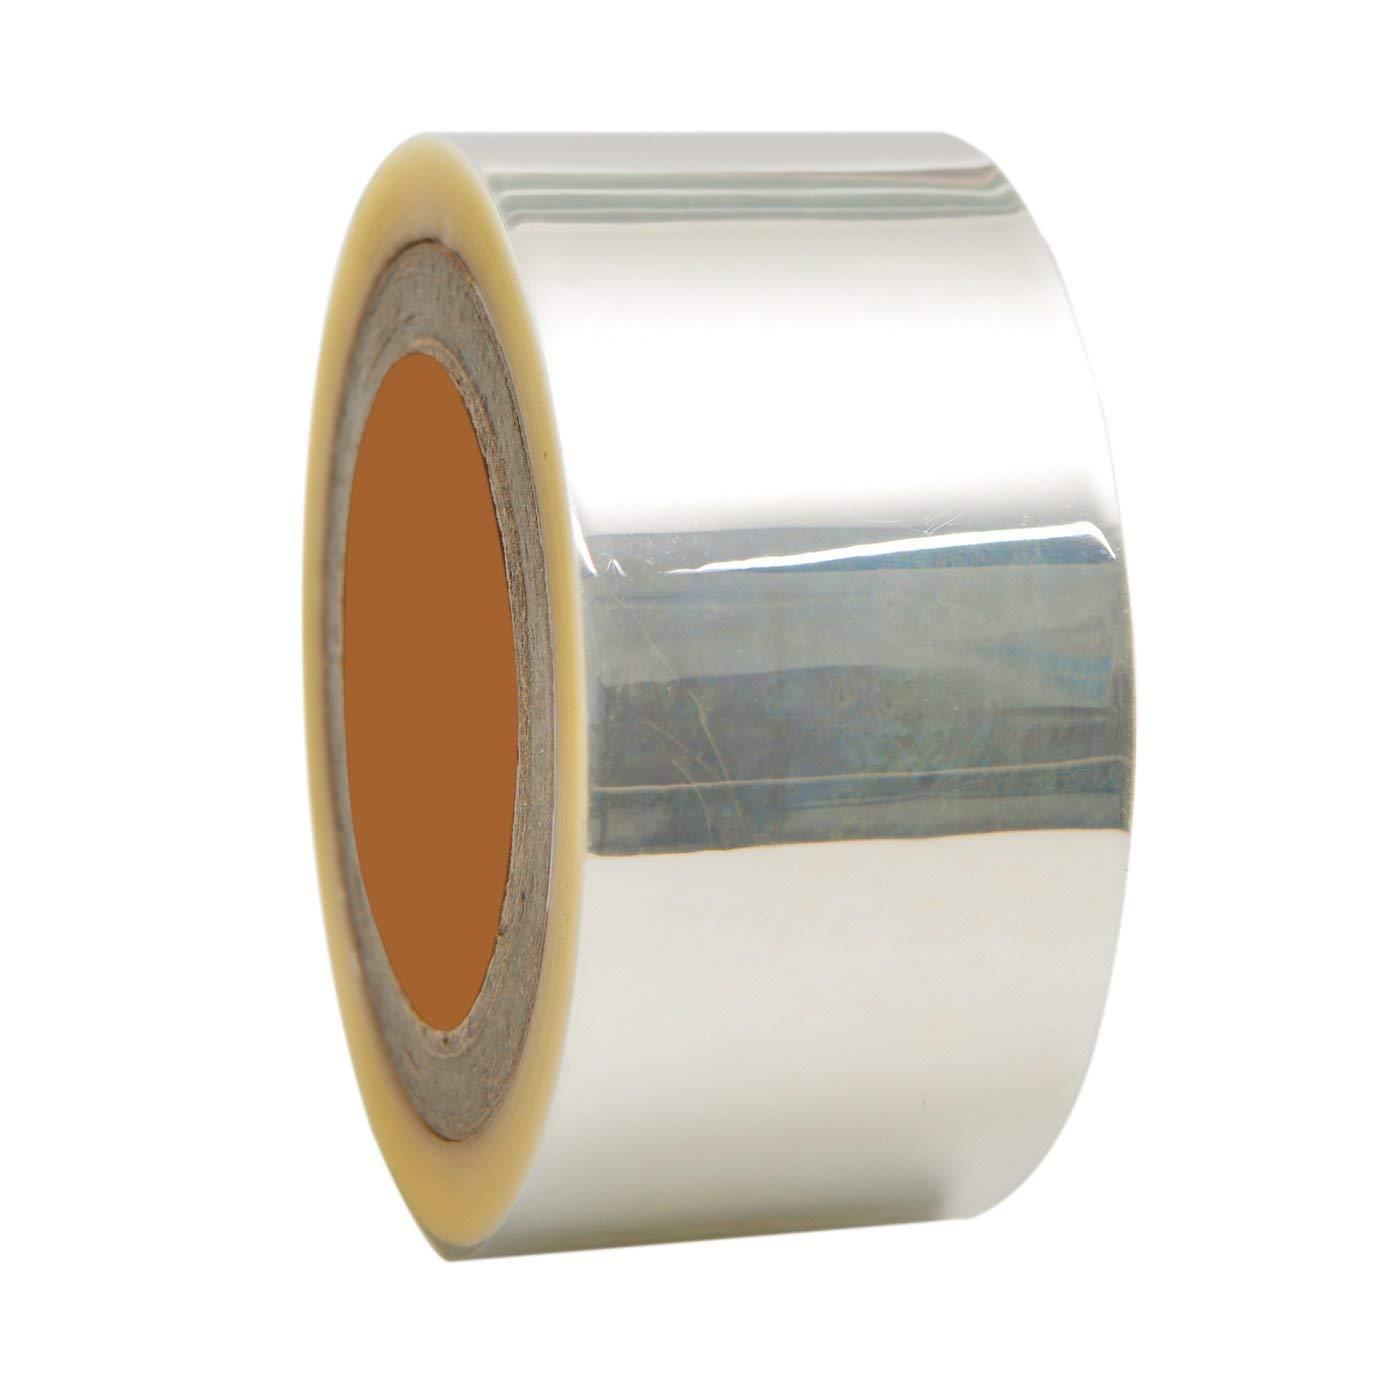 Cake Collar Acetate Sheets Roll for Chocolate Mousse Baking,Transparent Membrane Baking Surrounding Edge Tape Perimeter Decorating Acetate(6cmx80m)